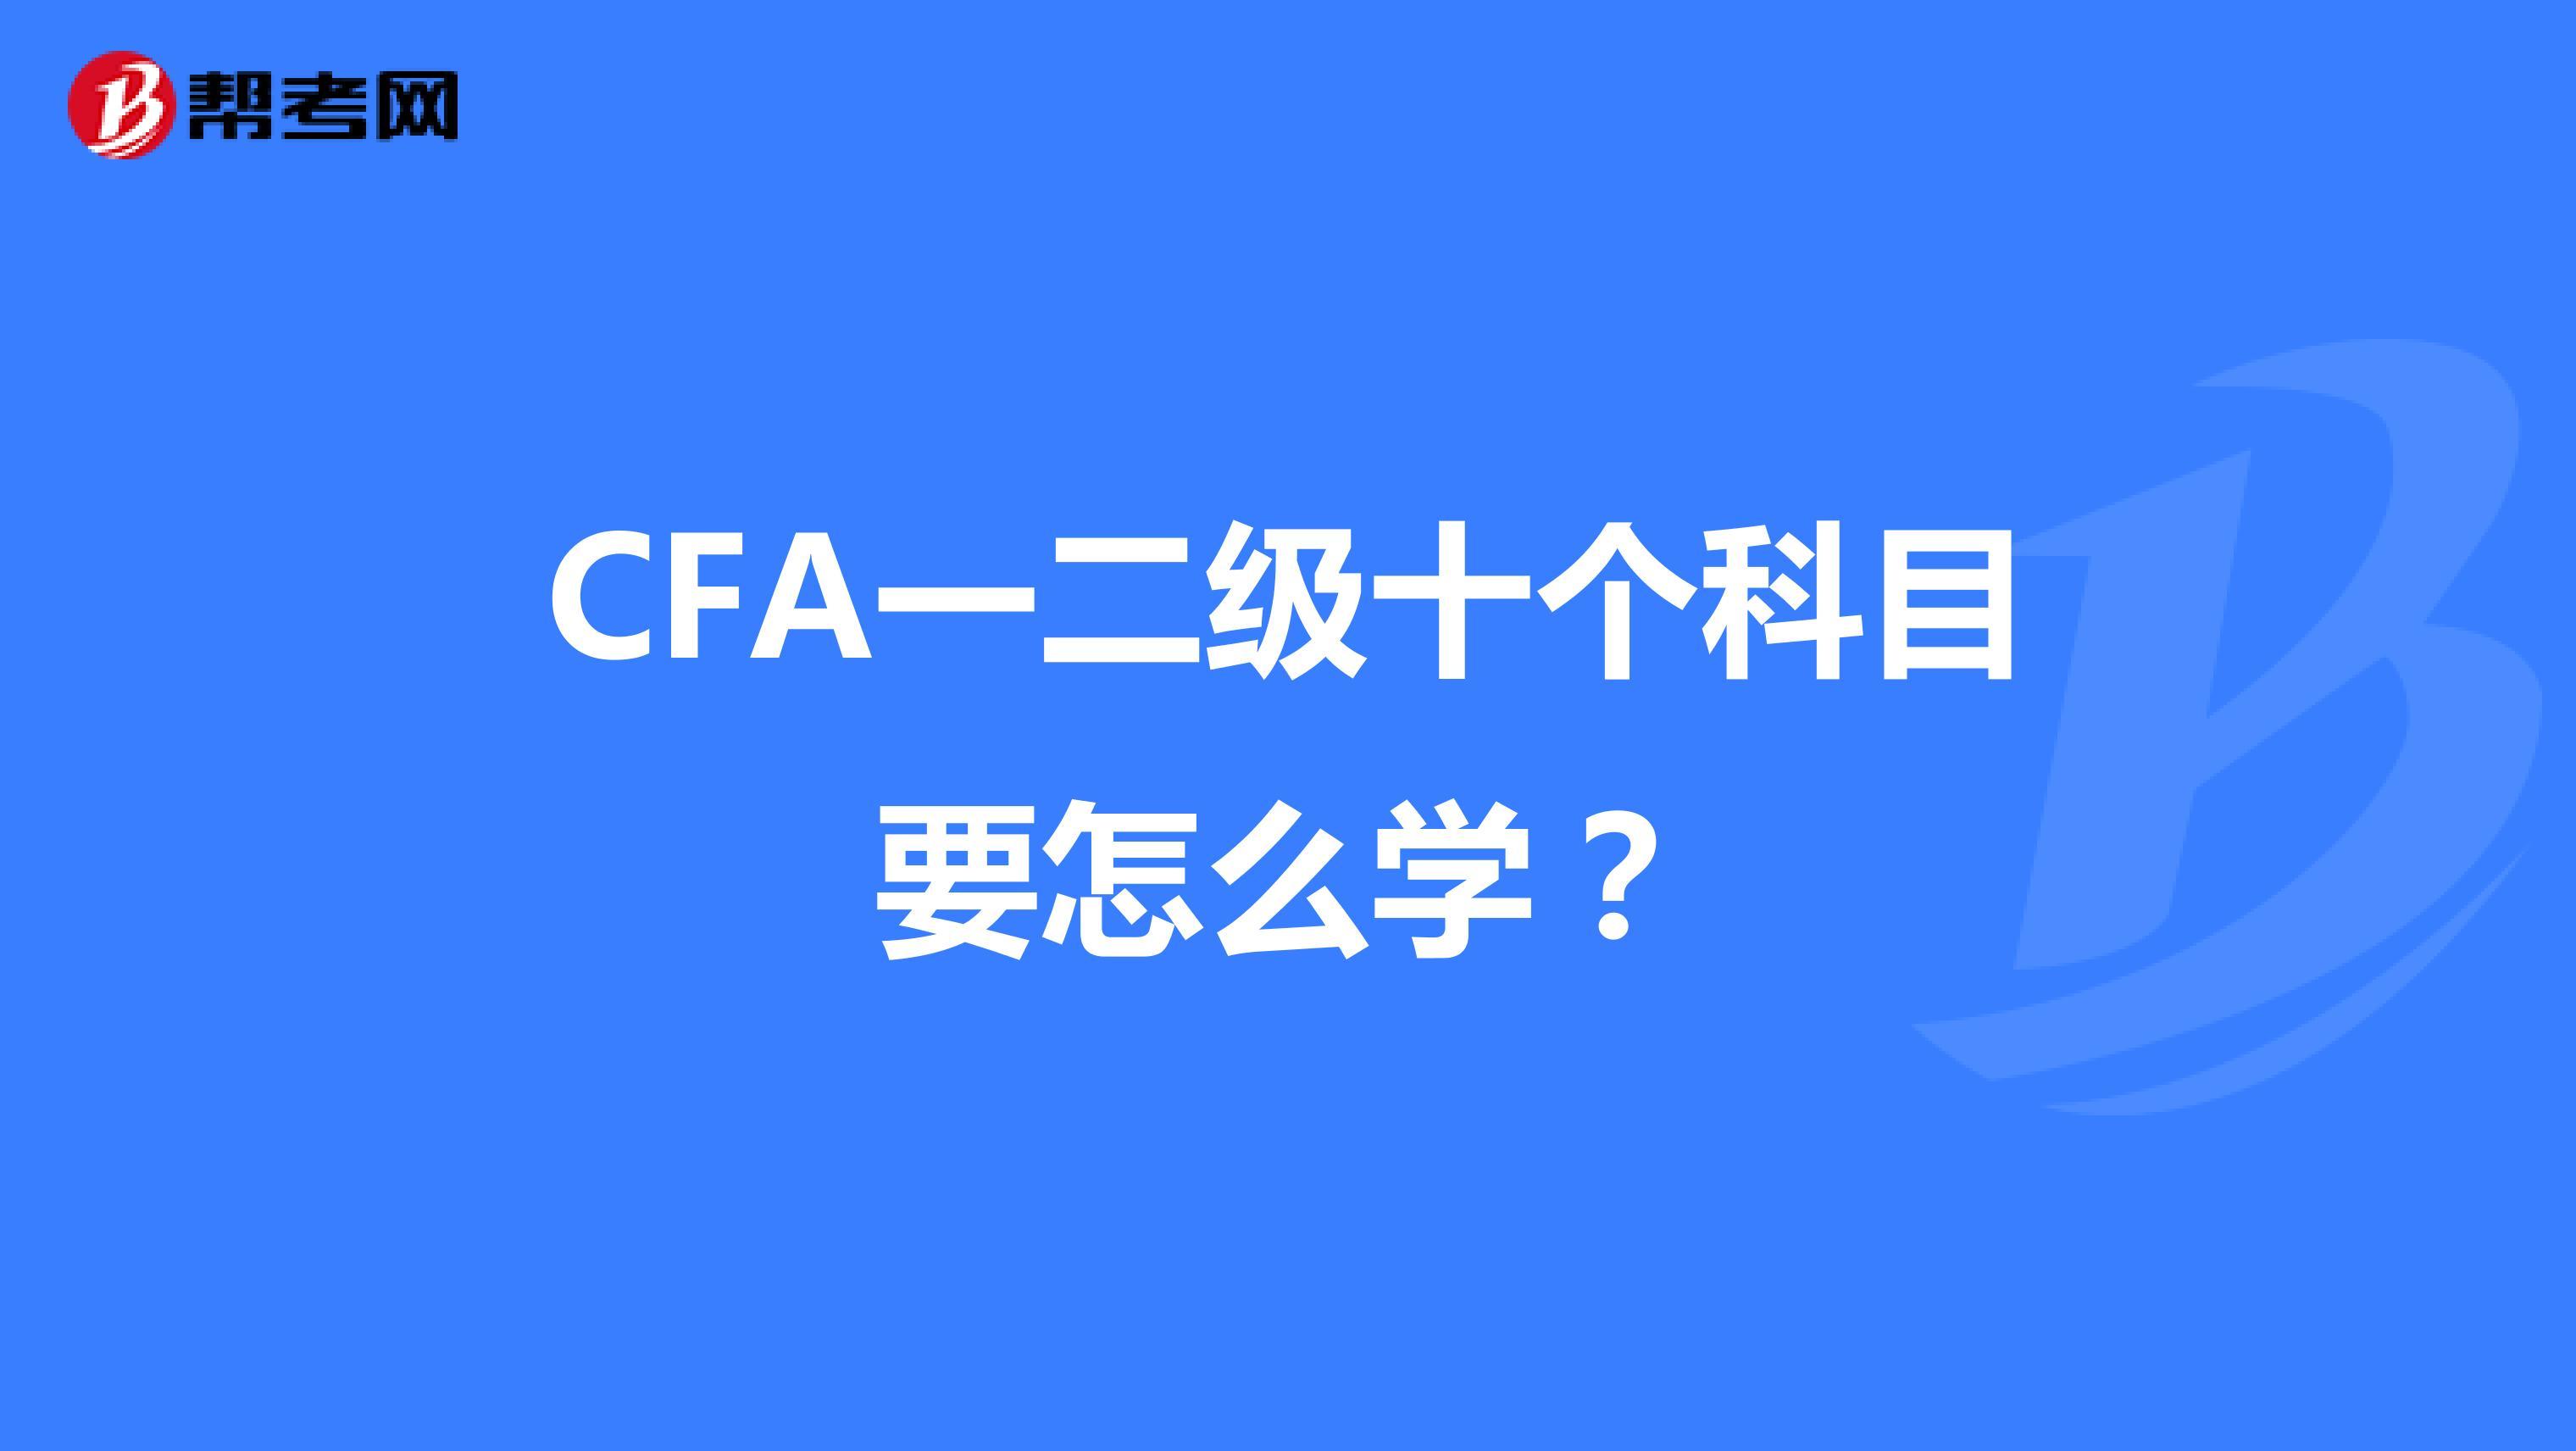 CFA一二级十个科目要怎么学?